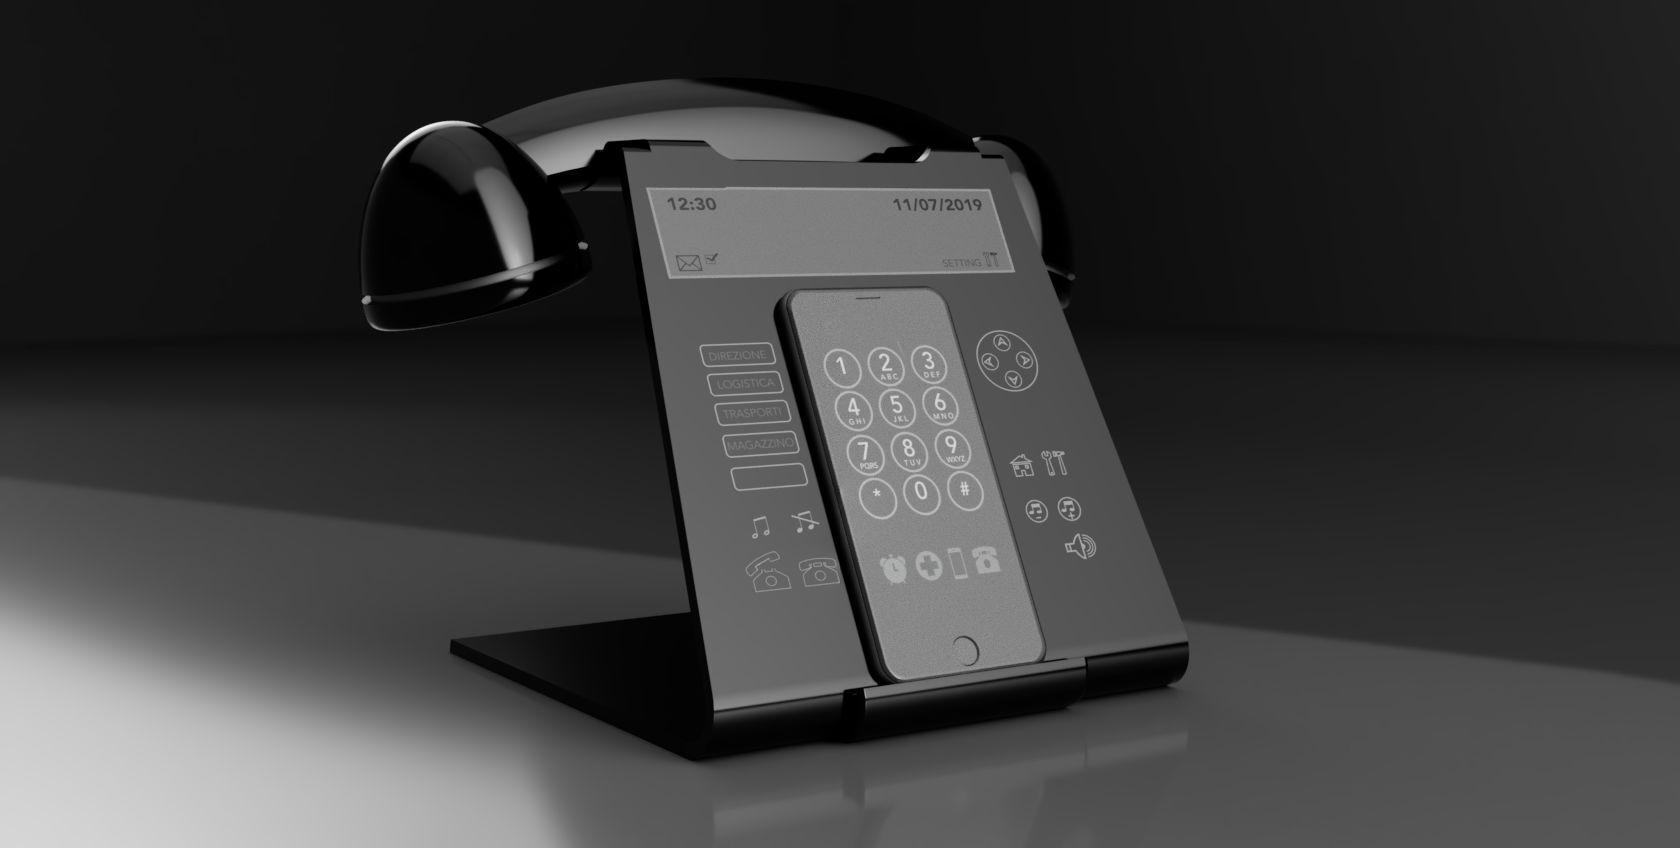 Phoneufficiocontastiera-2019-jul-15-07-34-19am-000-customizedview14060677847-png-3500-3500